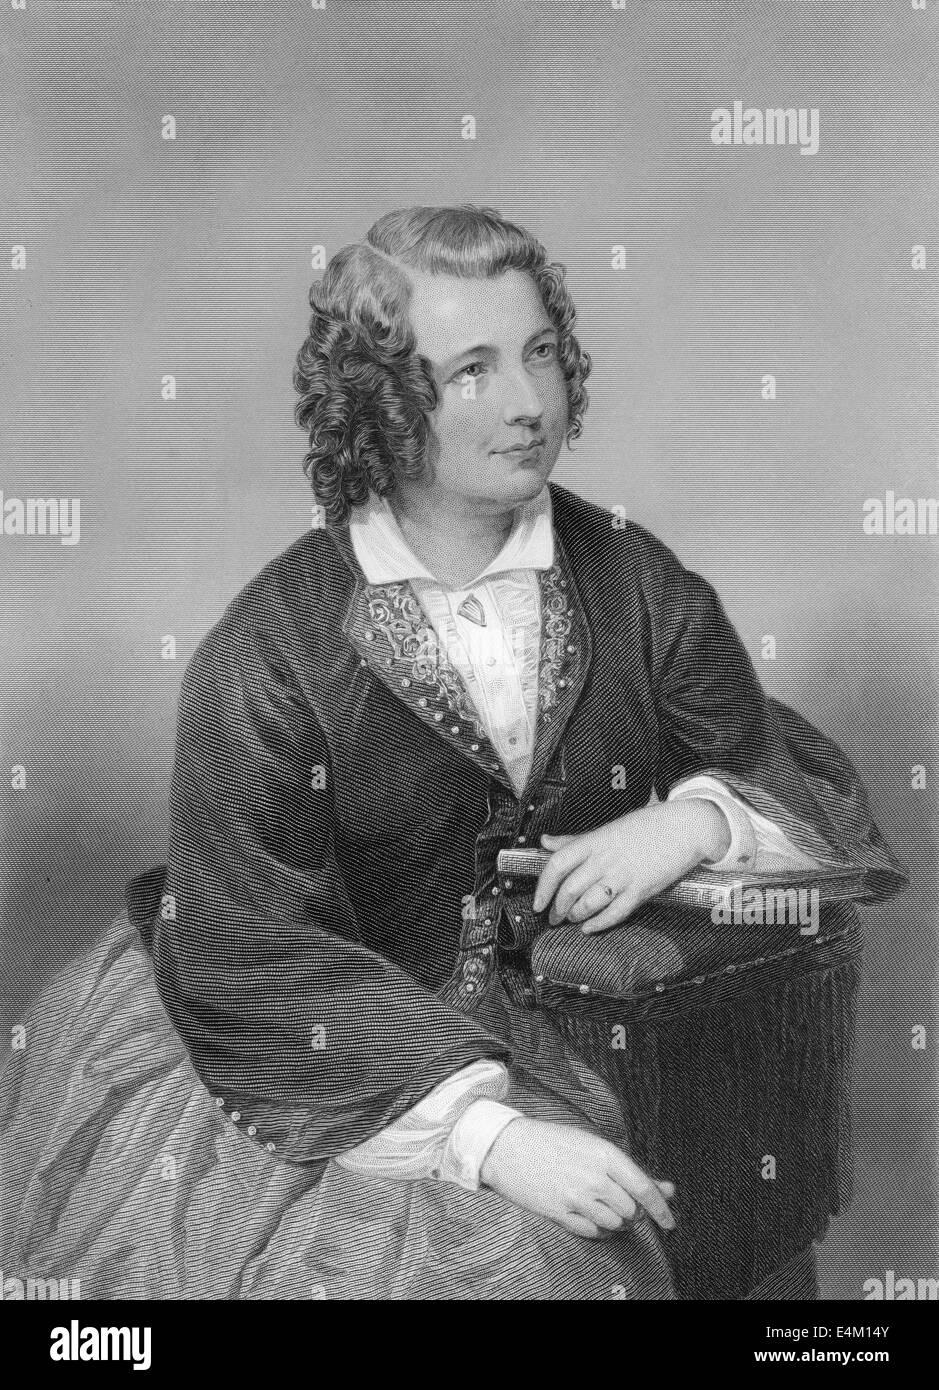 Eliza Cook, 1818 - 1889, an English author, - Stock Image